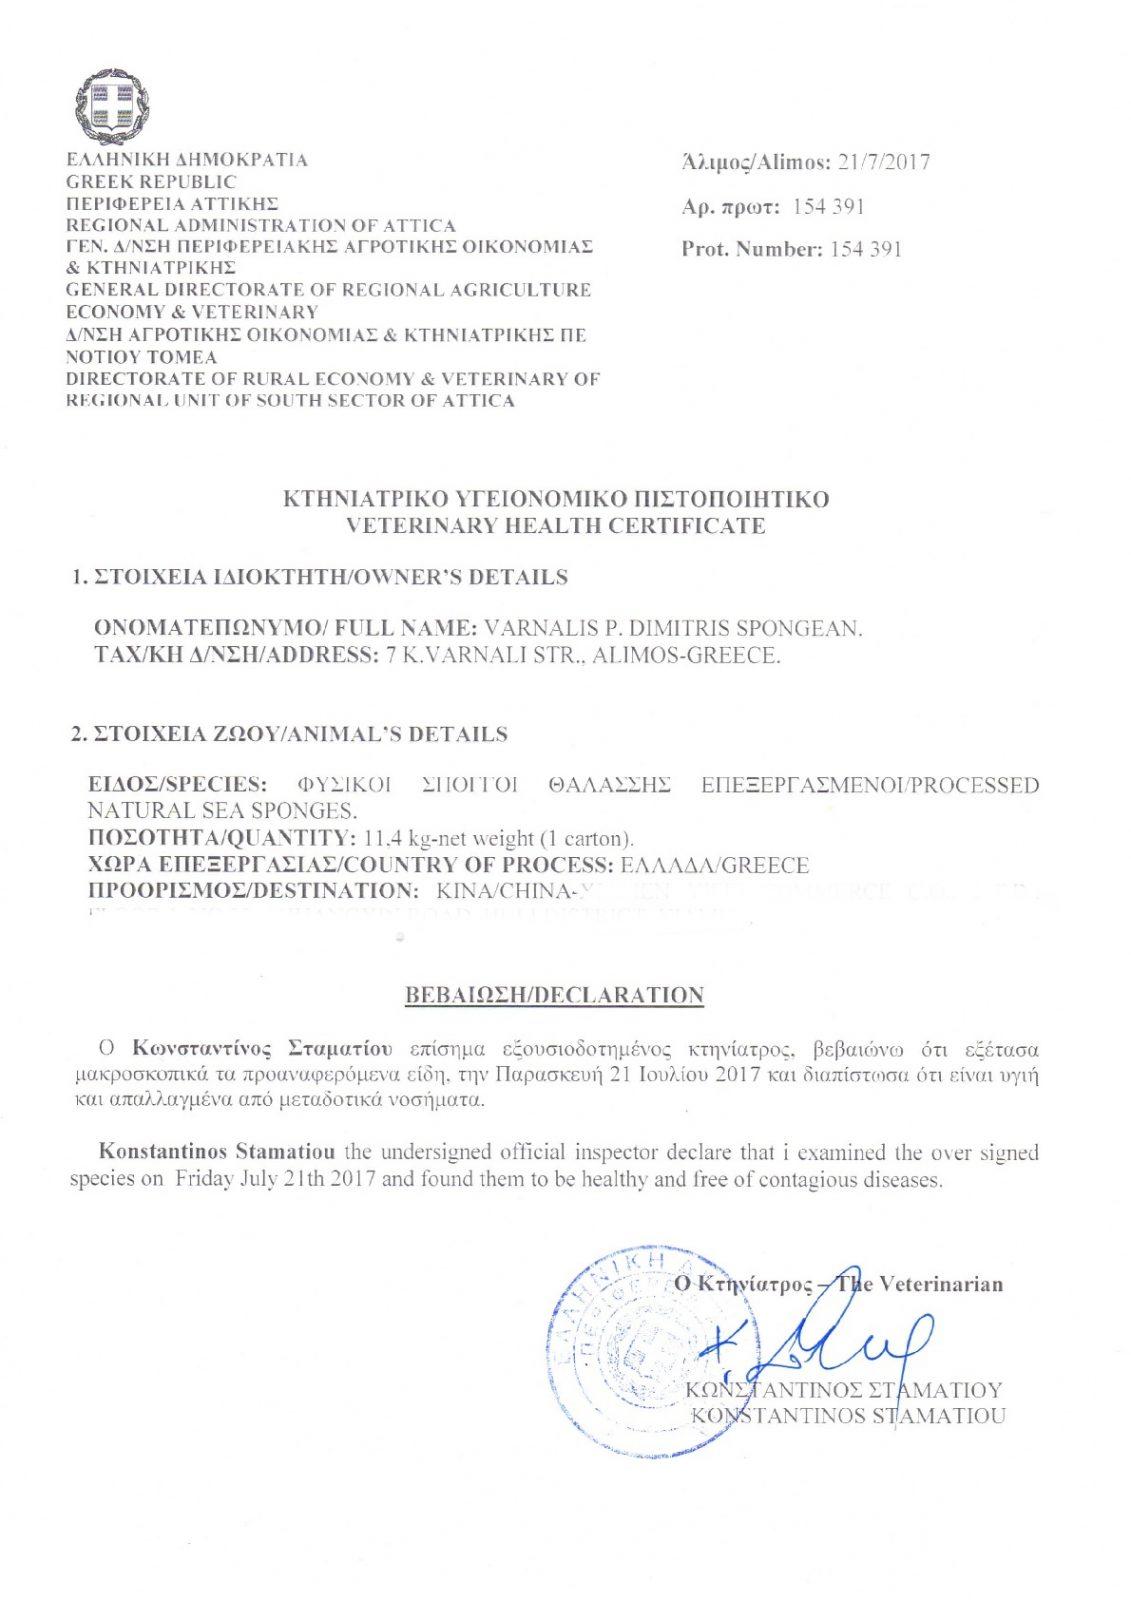 Spongean Veterinary health Certificate (in Eng & Gr)